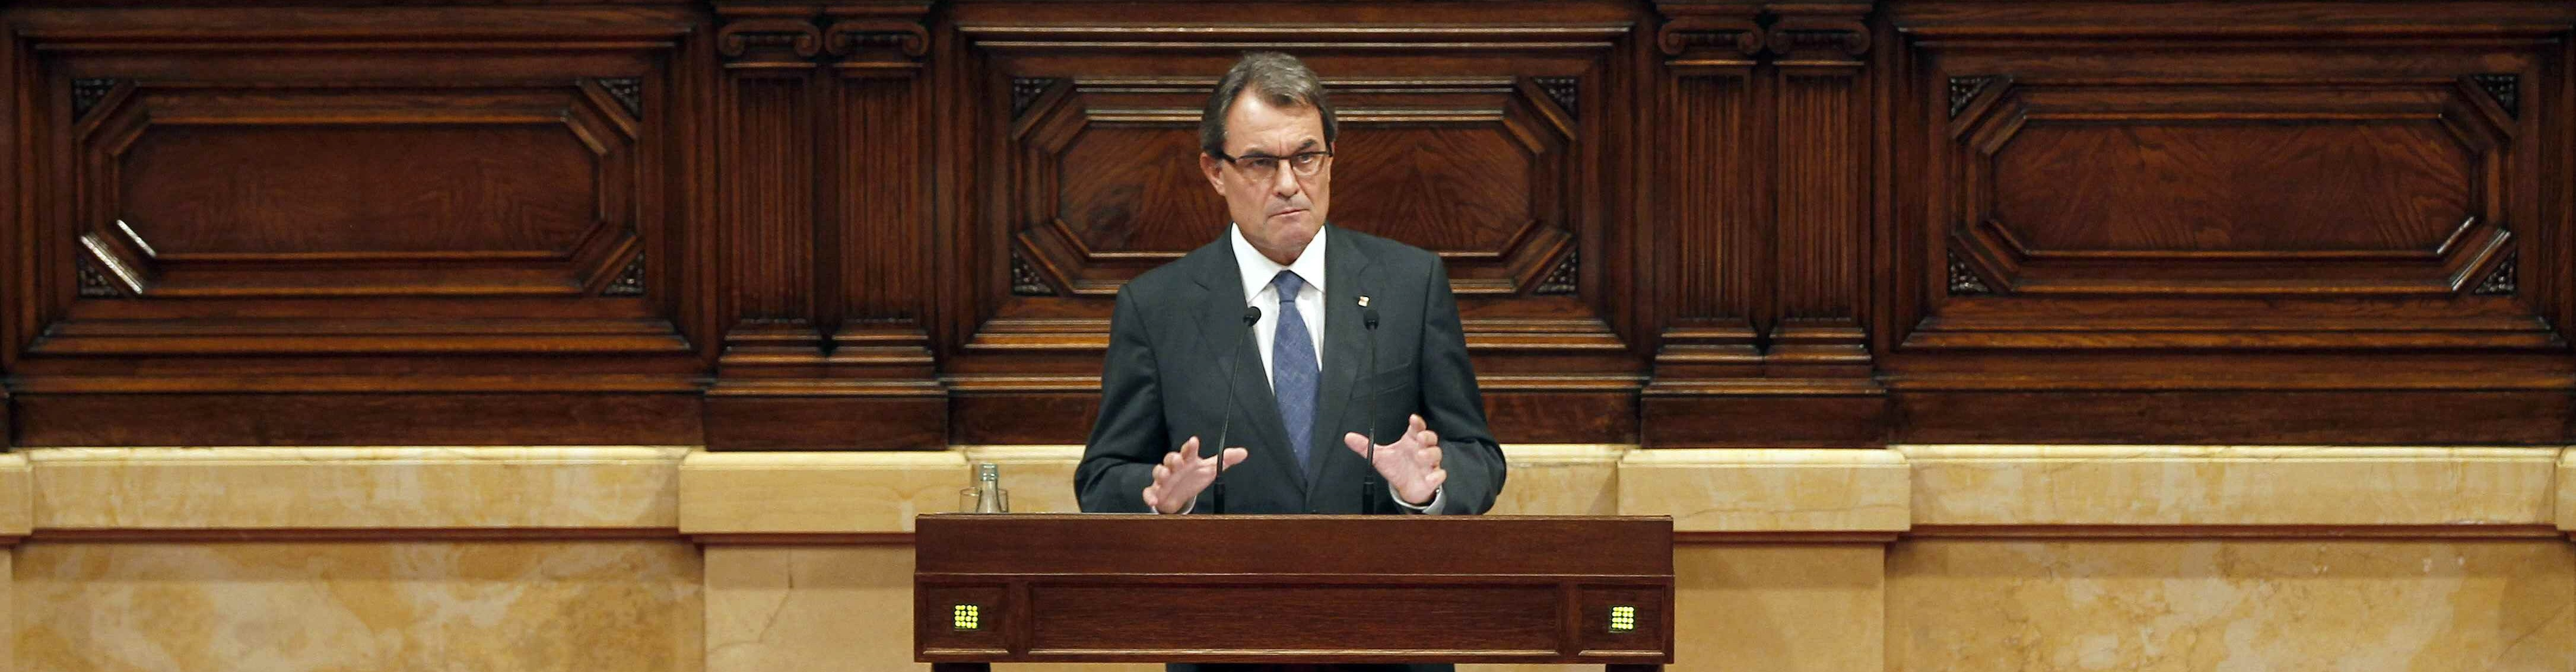 mas-parlamento-250912.JPG